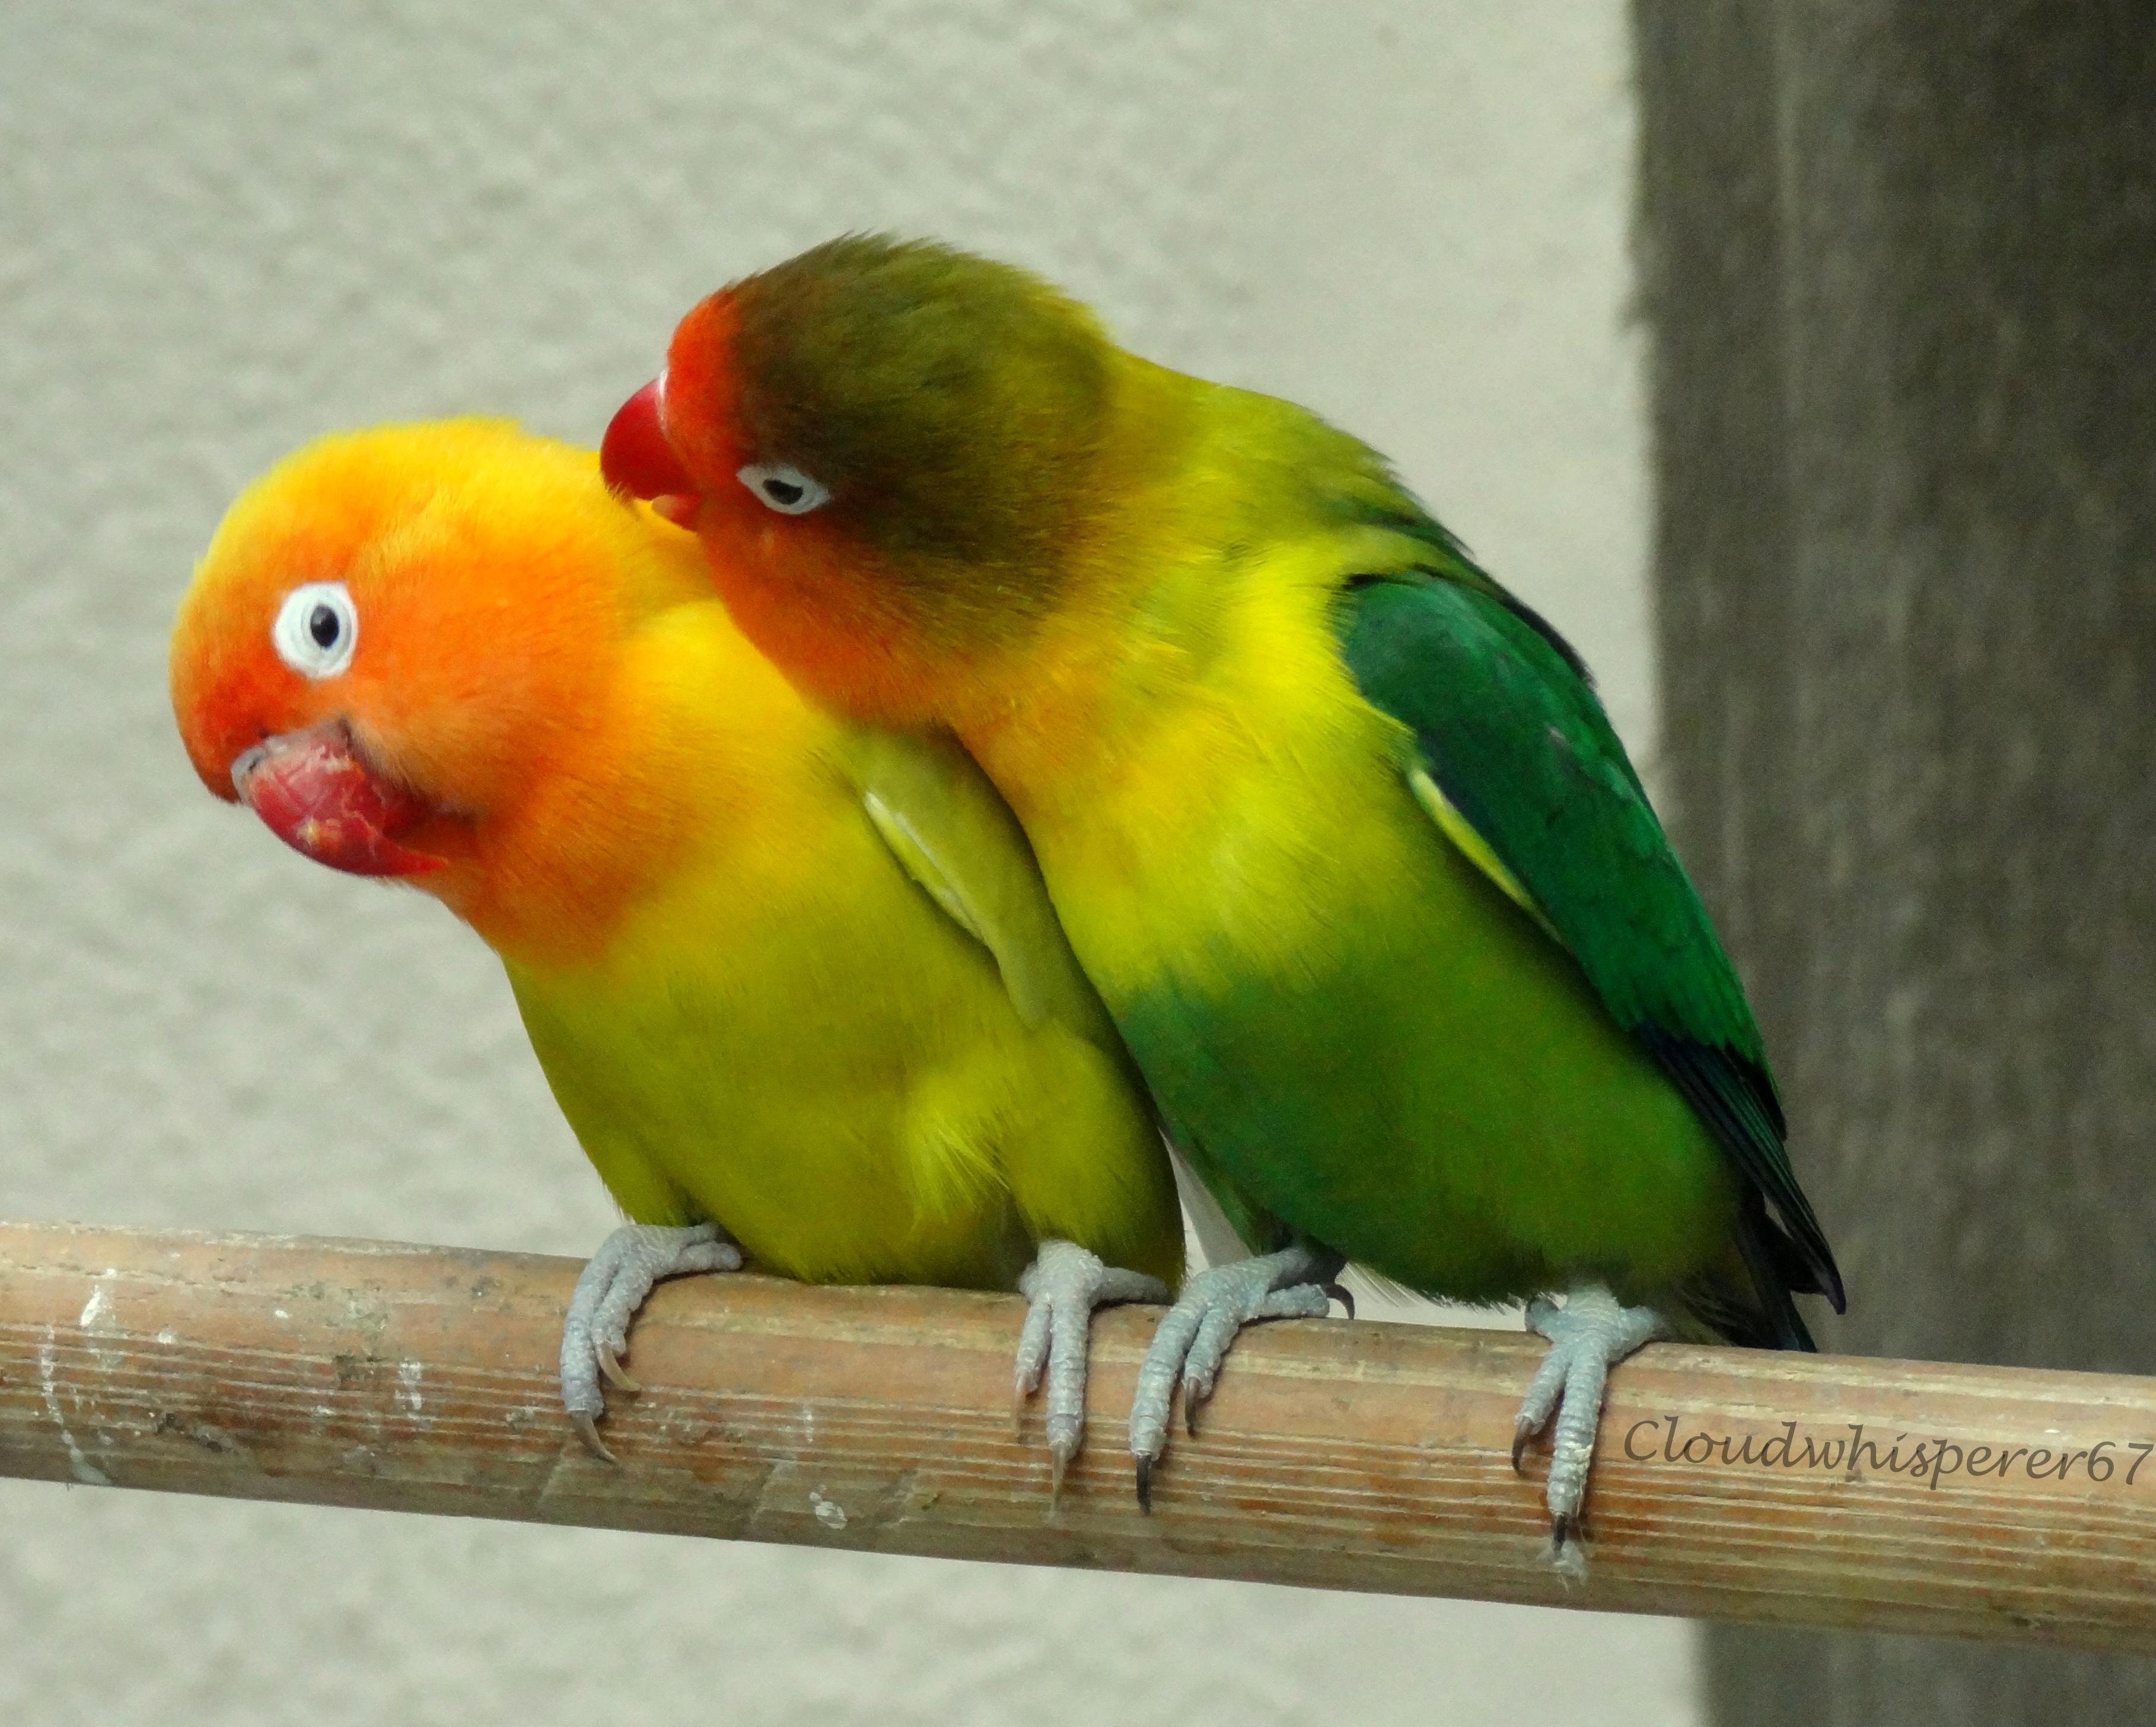 Most Inspiring Wallpaper Love Bird - images-of-love-birds-10  Snapshot_737044.jpg